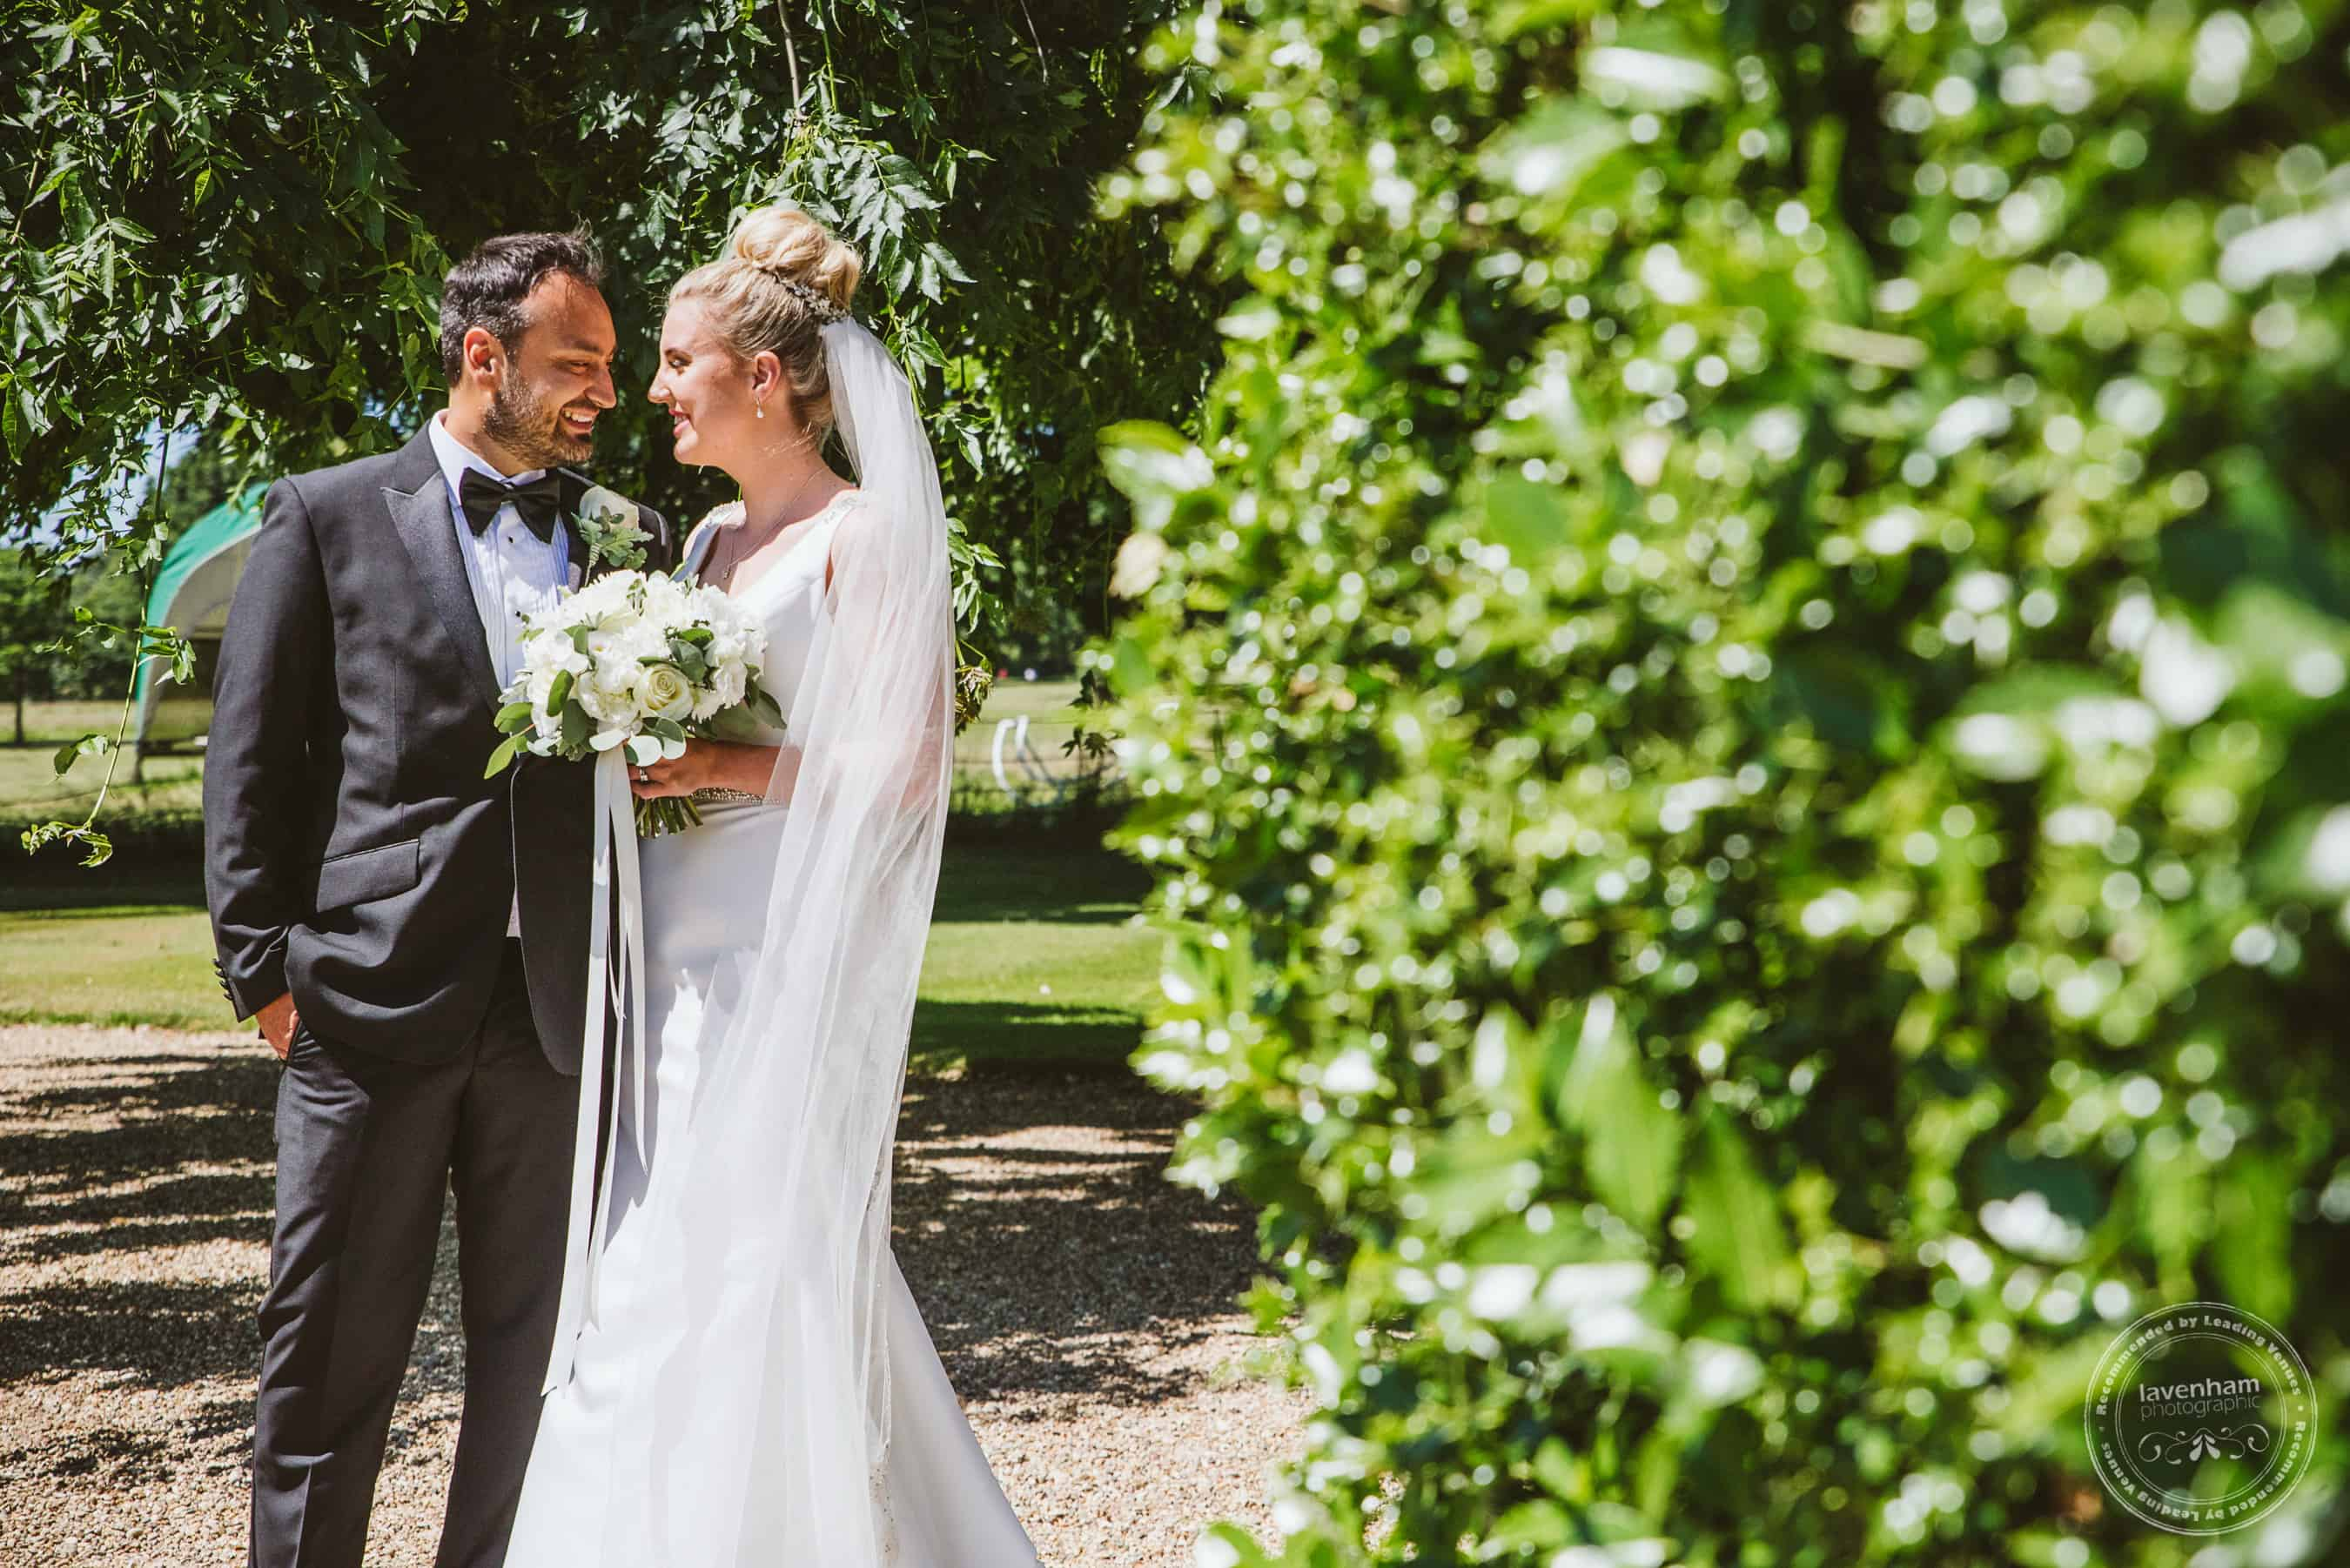 220618 Gosfield Hall Wedding Photography Lavenham Photographic 0096